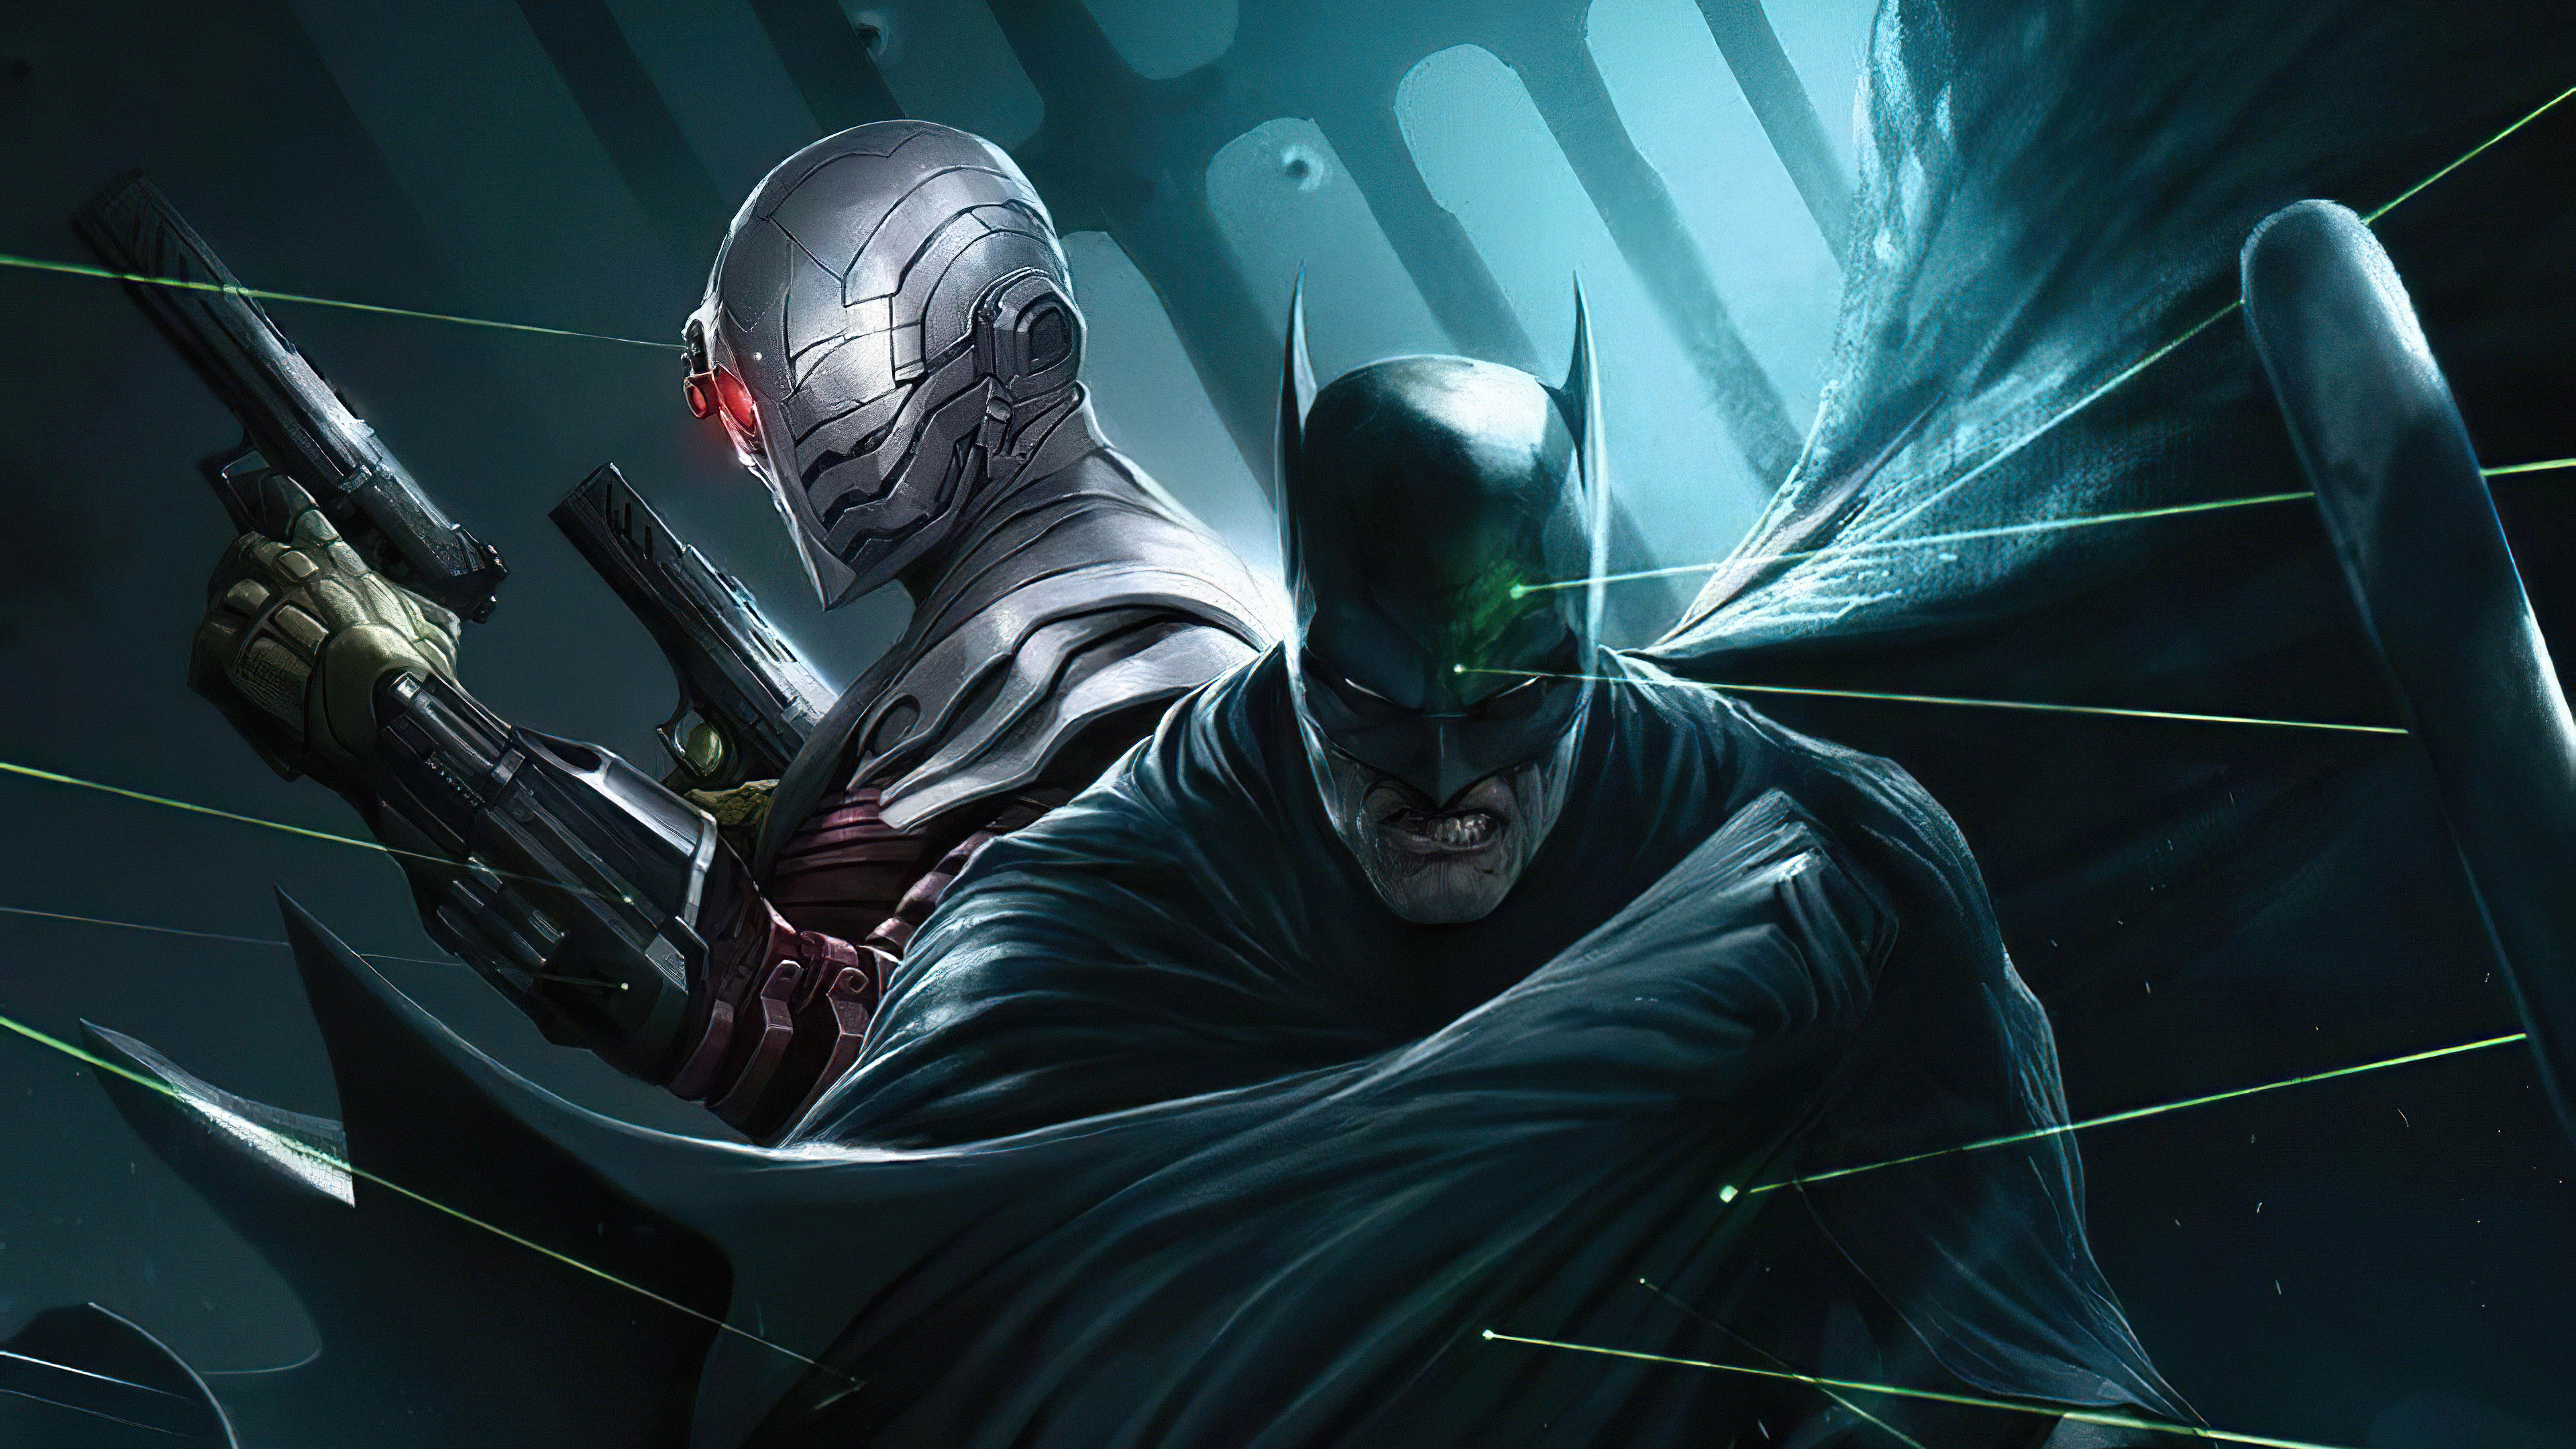 batman and deathstroke 1576091242 - Batman And Deathstroke - Batman Vs DeathStroke wallpaper 4k, 4k Batman Vs DeathStroke wallpaper